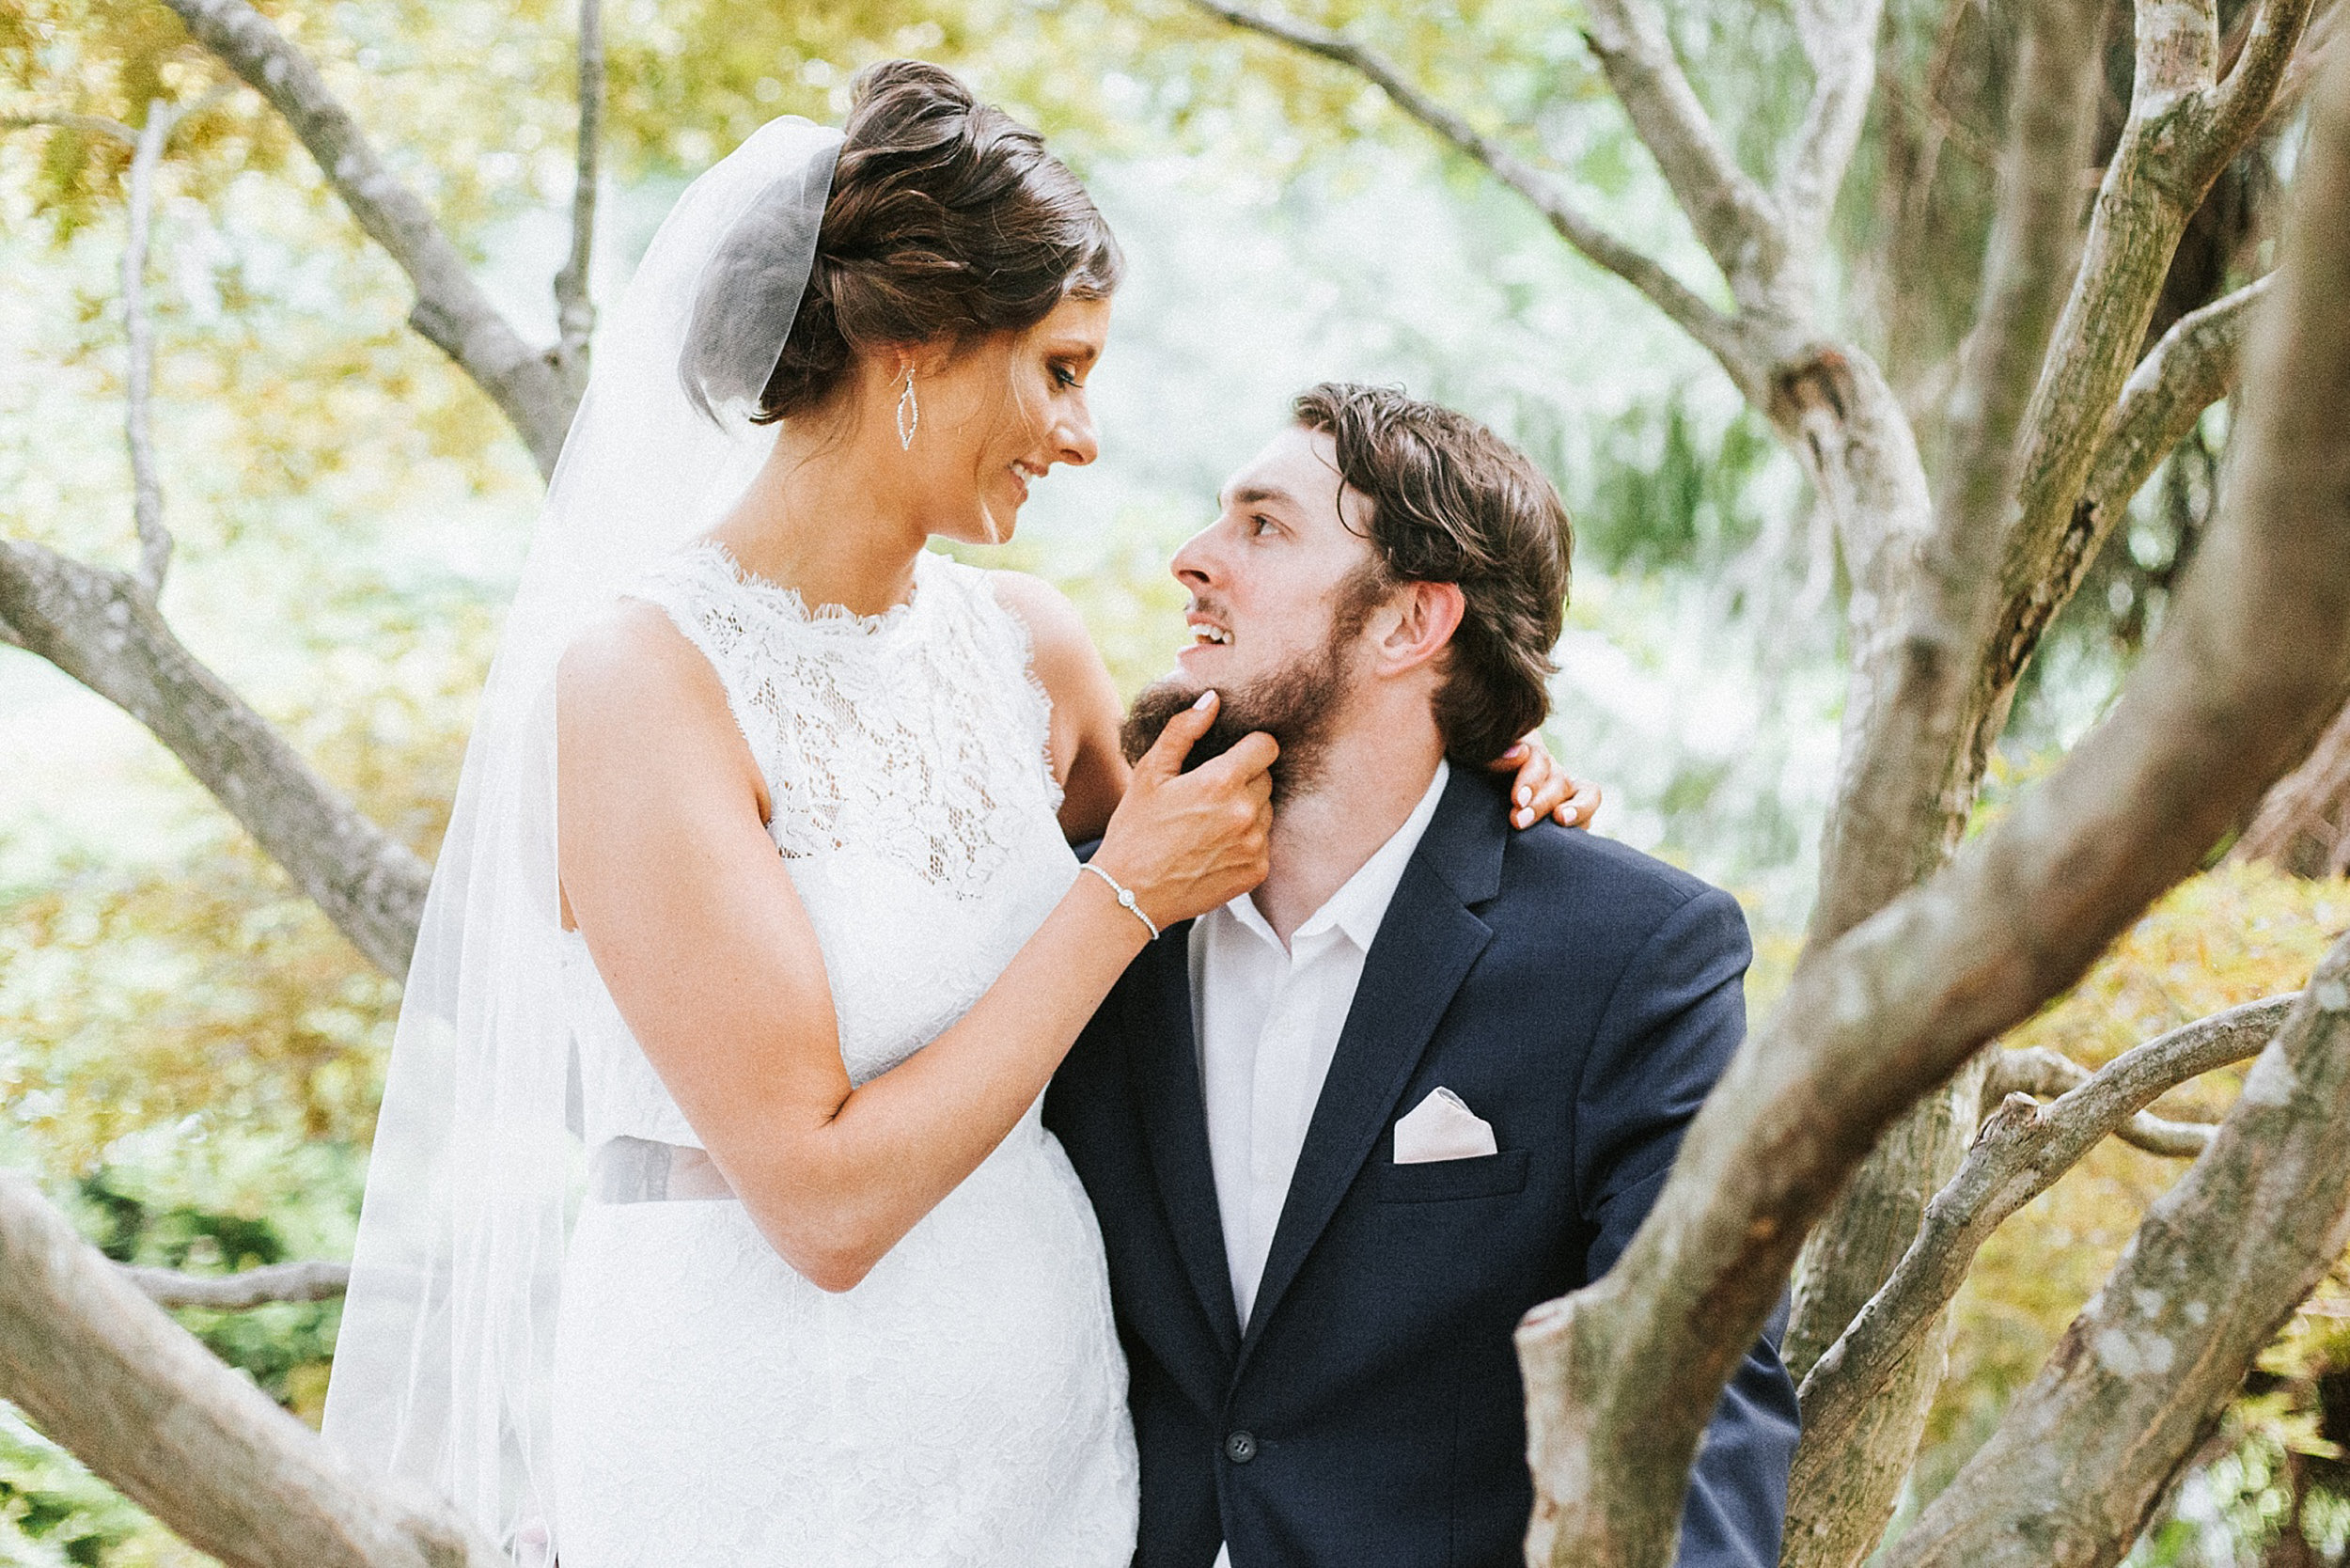 Brooke Townsend Photography - Ohio Wedding Photographer (40 of 78).jpg